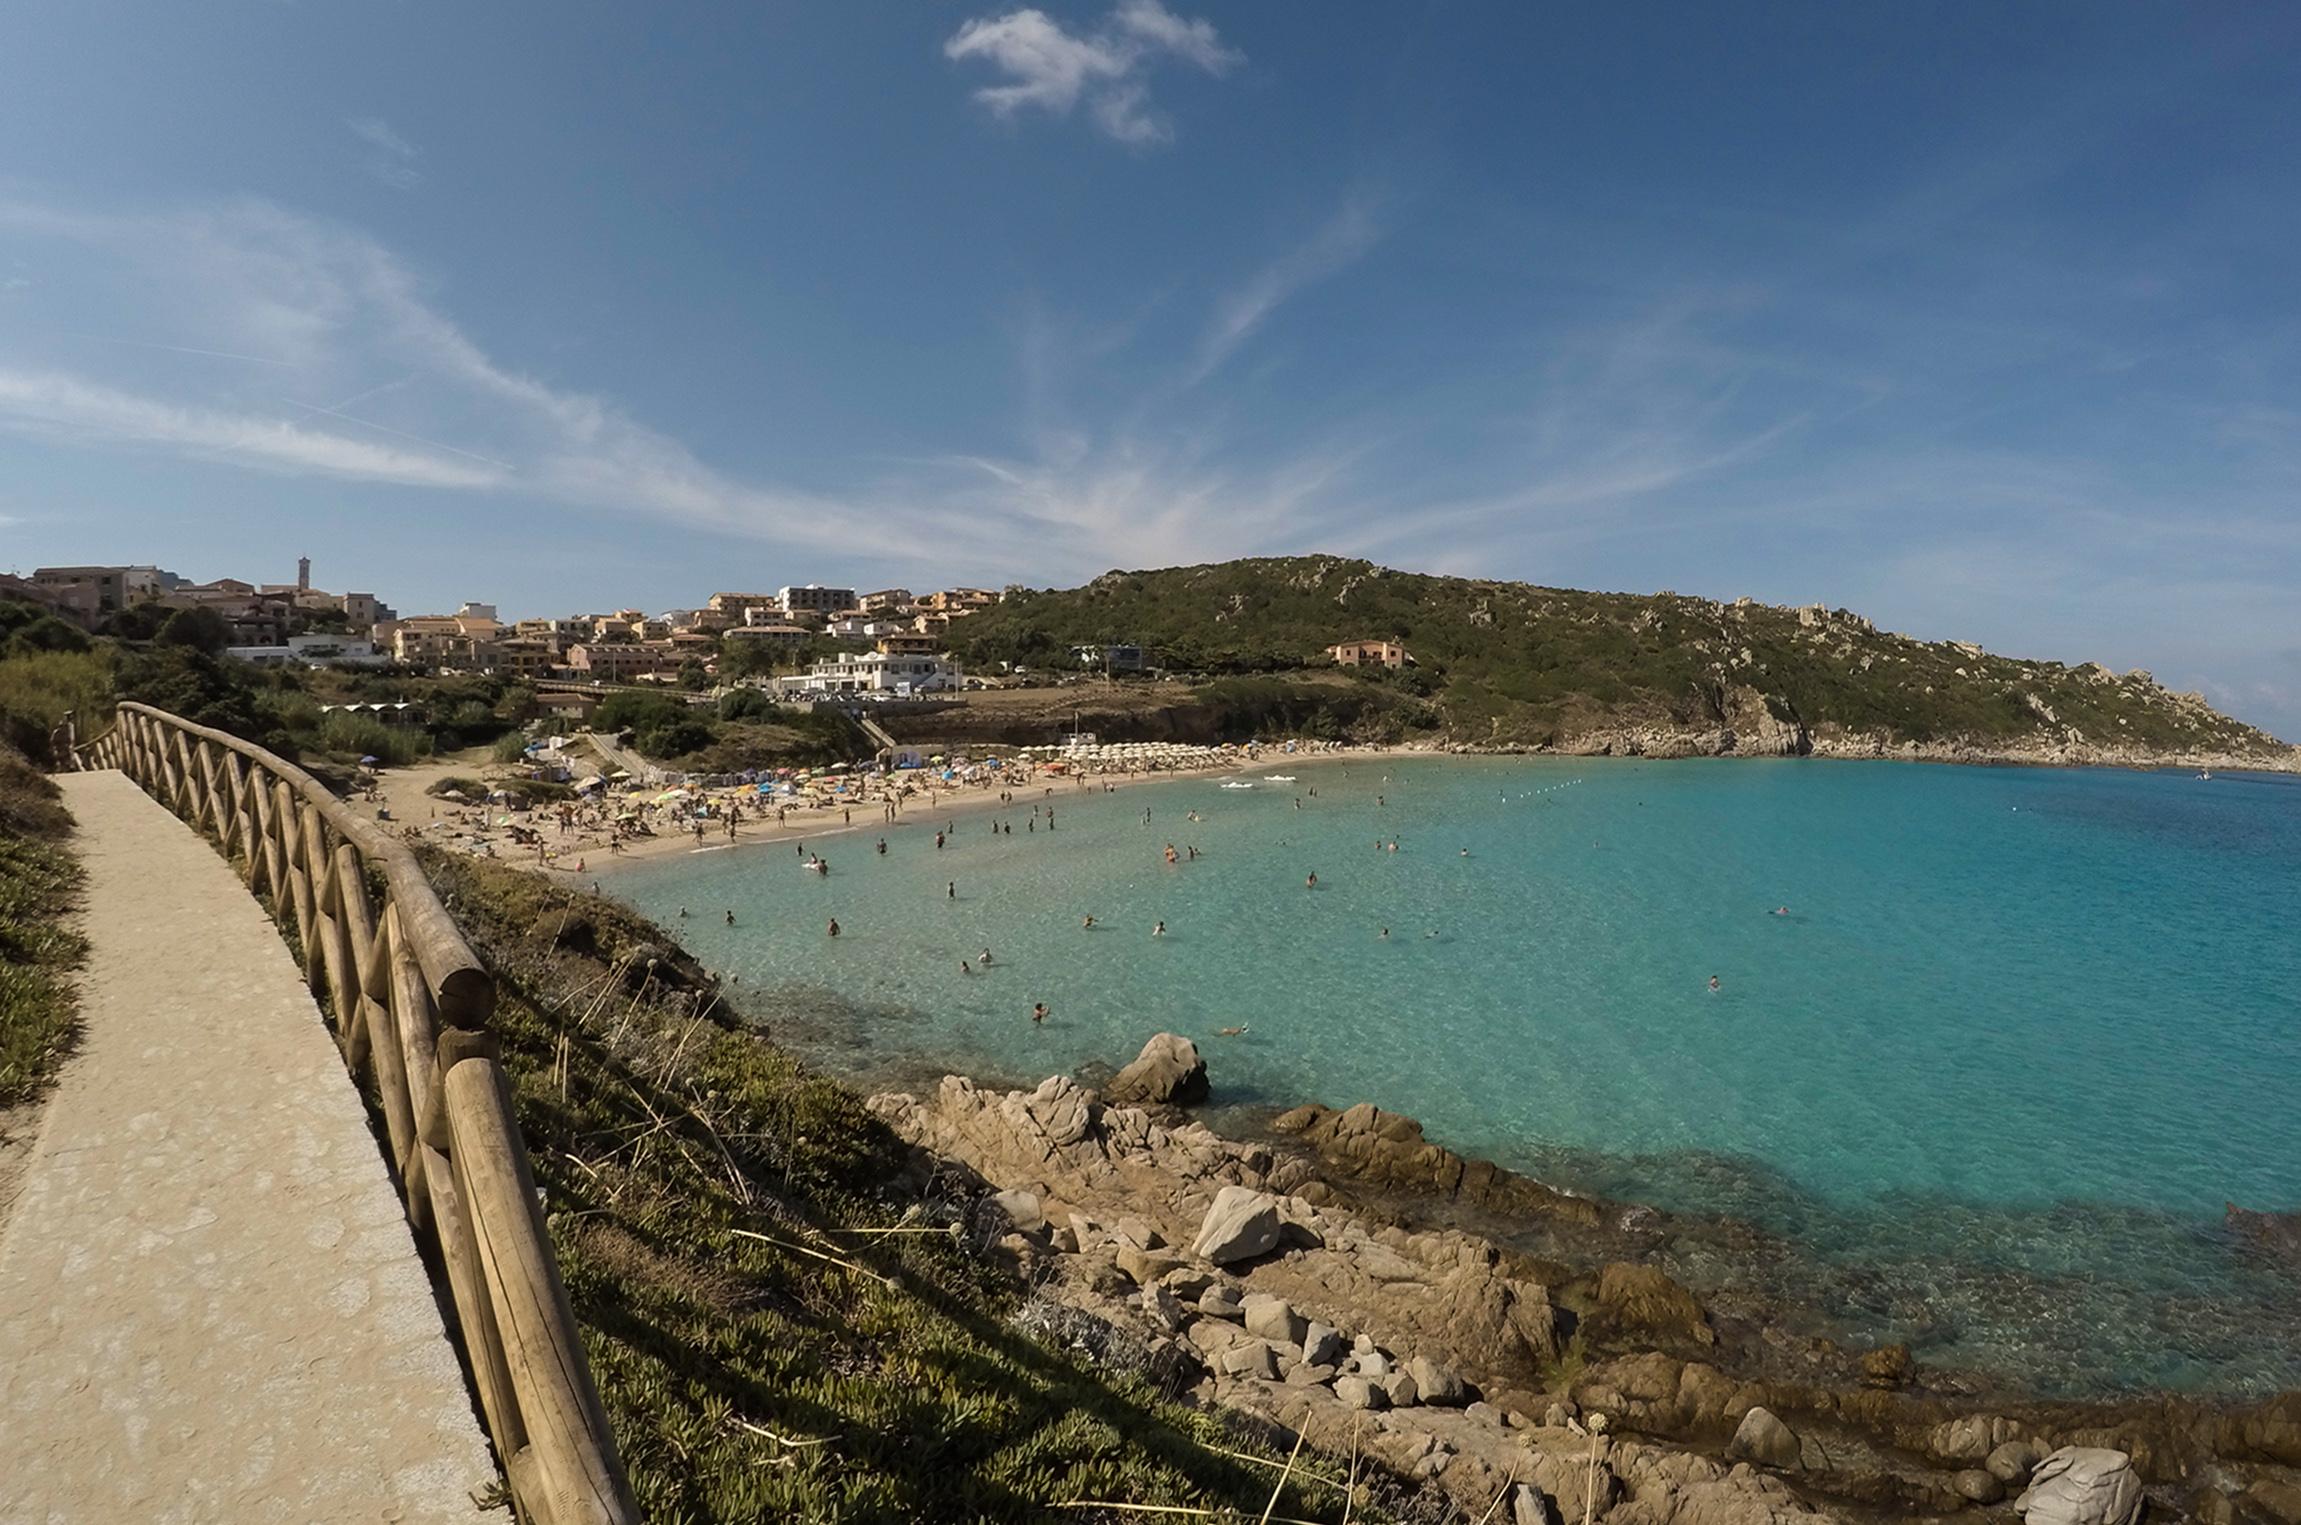 Spiaggia Rena Bianca - Santa Teresa di Gallura